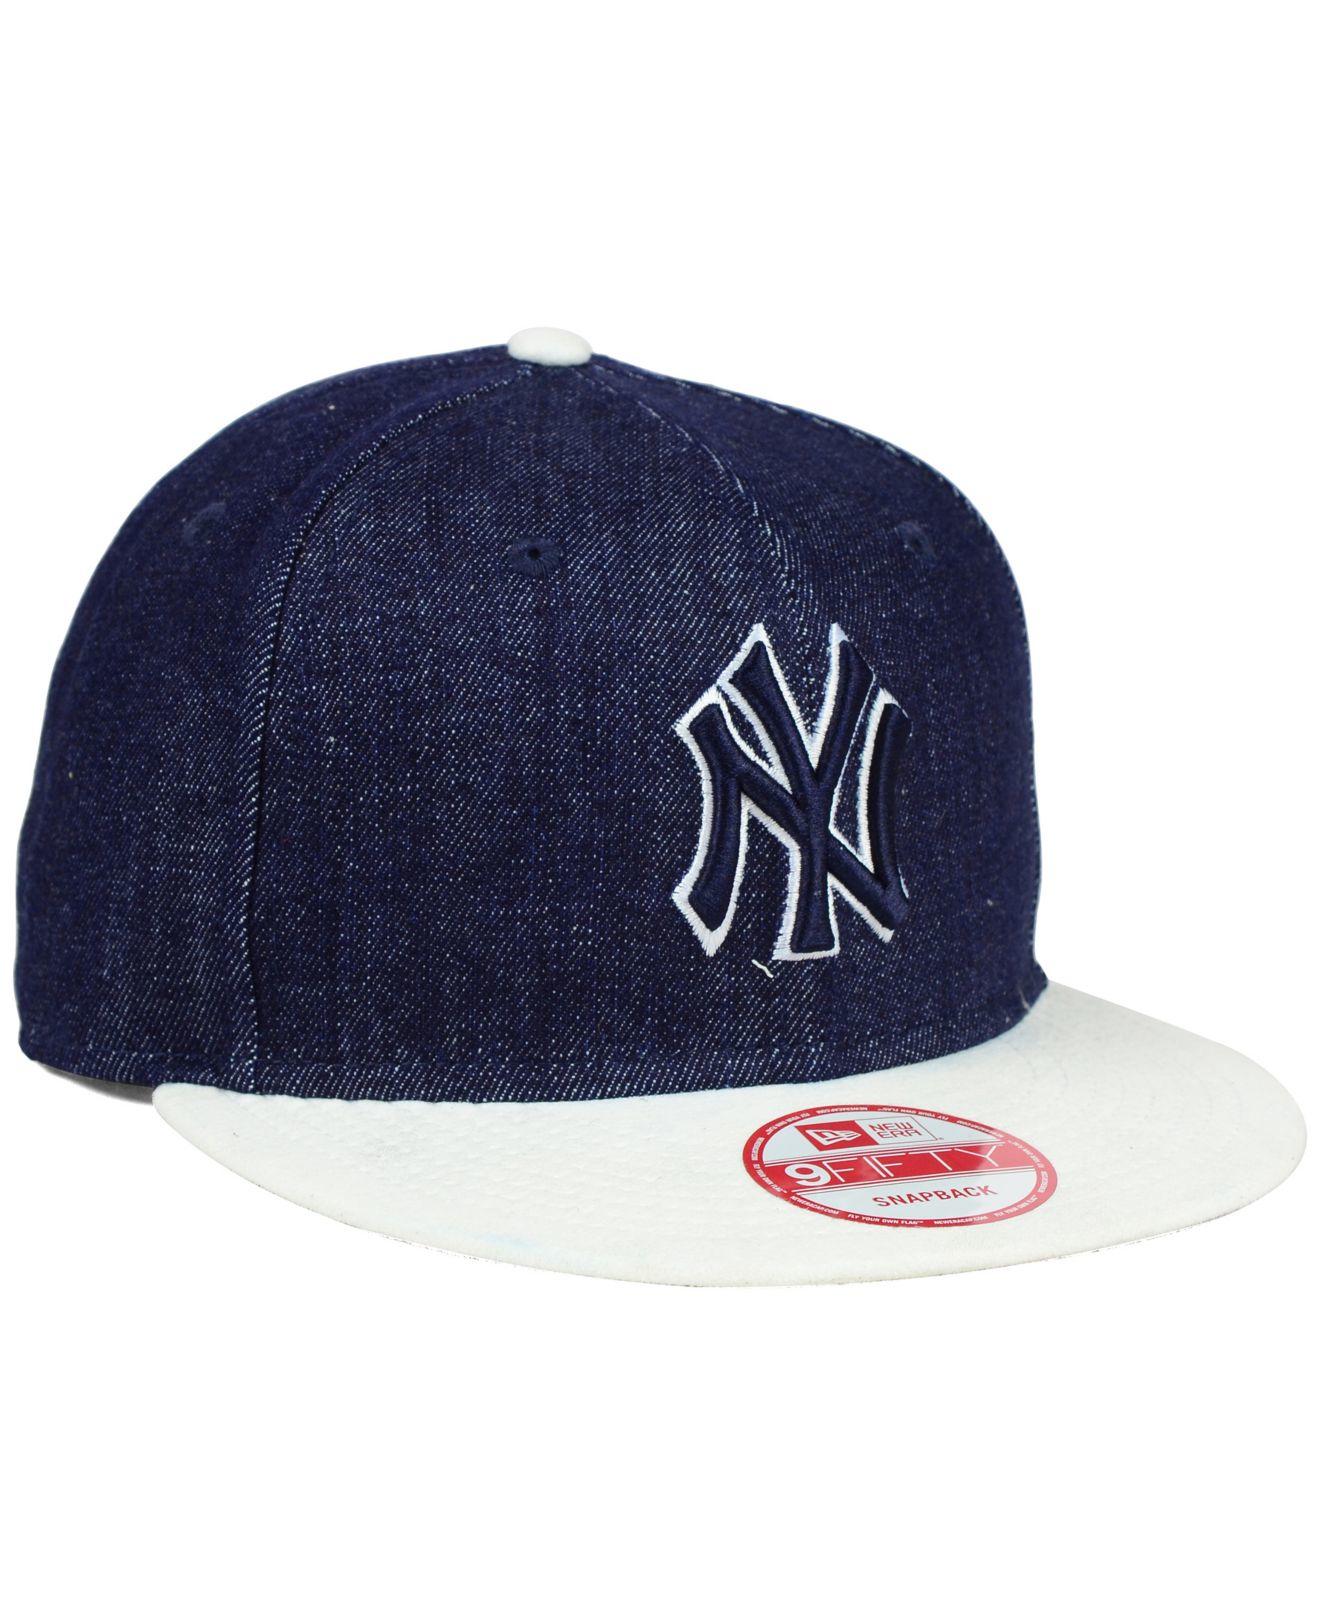 best website a1949 e0c00 ... new zealand lyst ktz new york yankees denim suede 9fifty snapback cap  in blue 70fb4 6ab8f promo code 2016 mlb ...